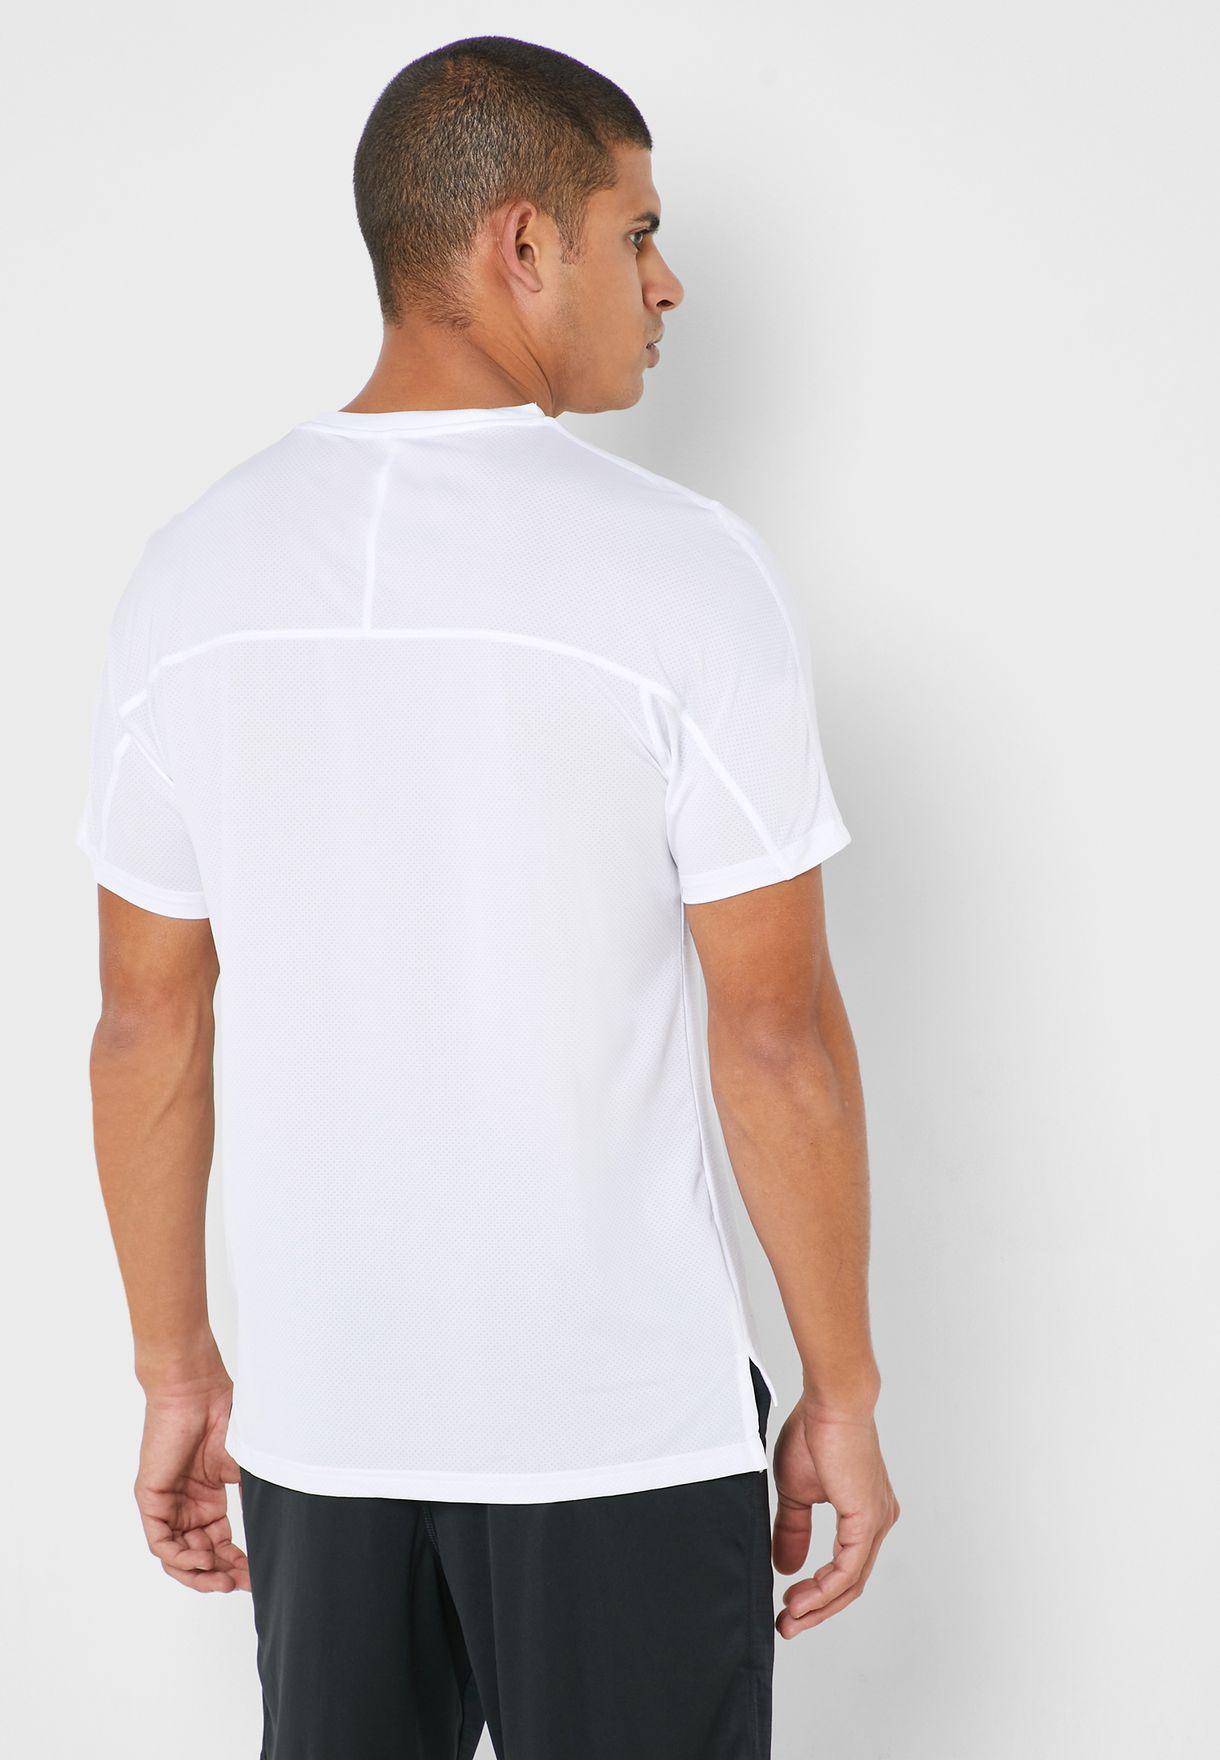 Training Supply Smartvent T-Shirt